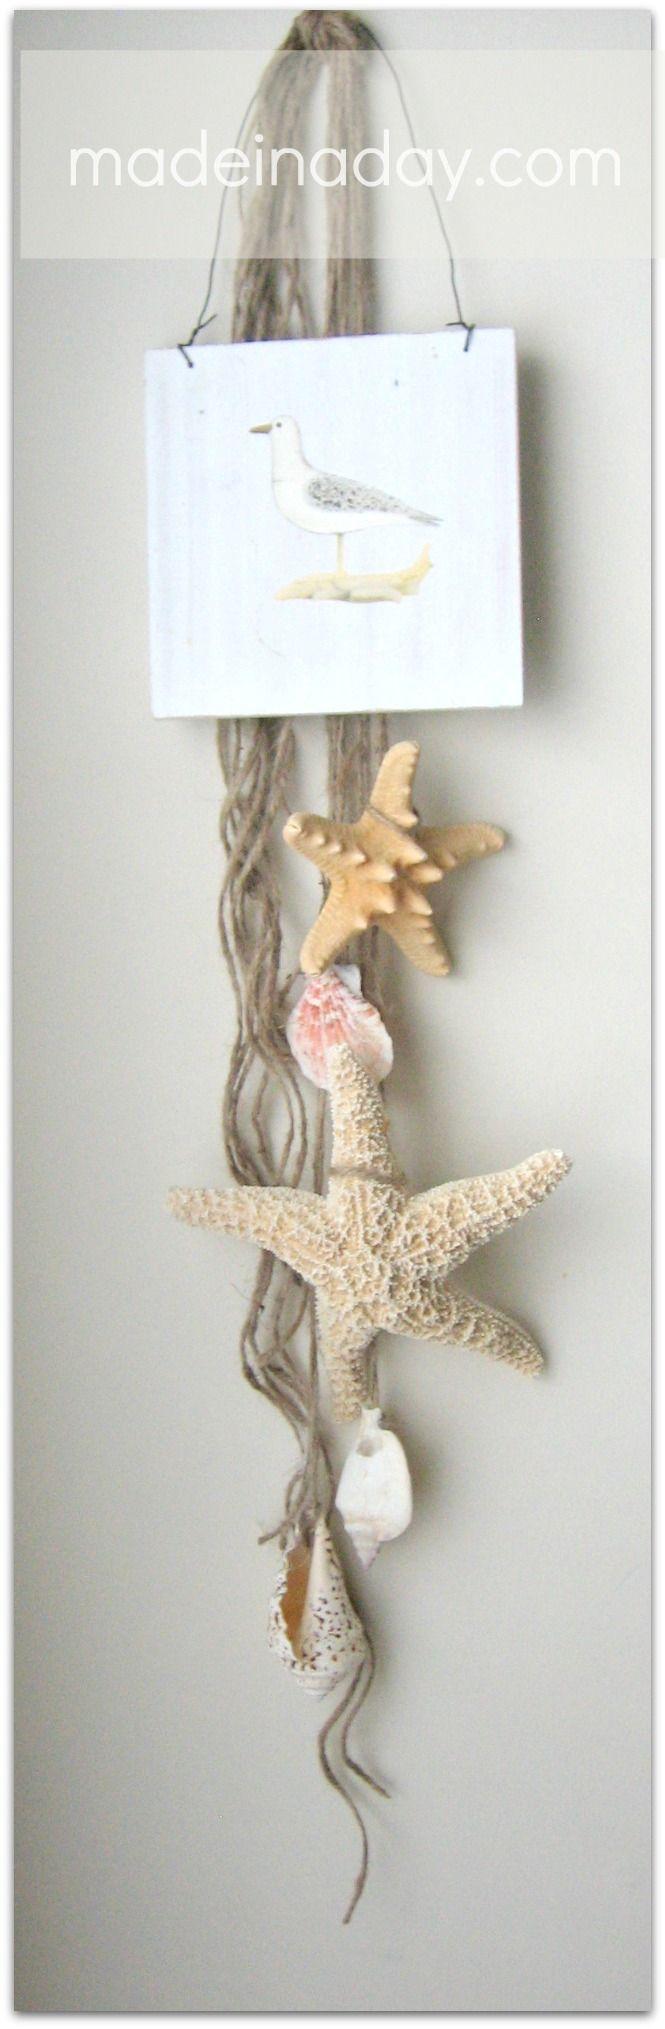 Bulk Starfish Decorations 17 Best Images About Seashells On Pinterest Starfish Shell